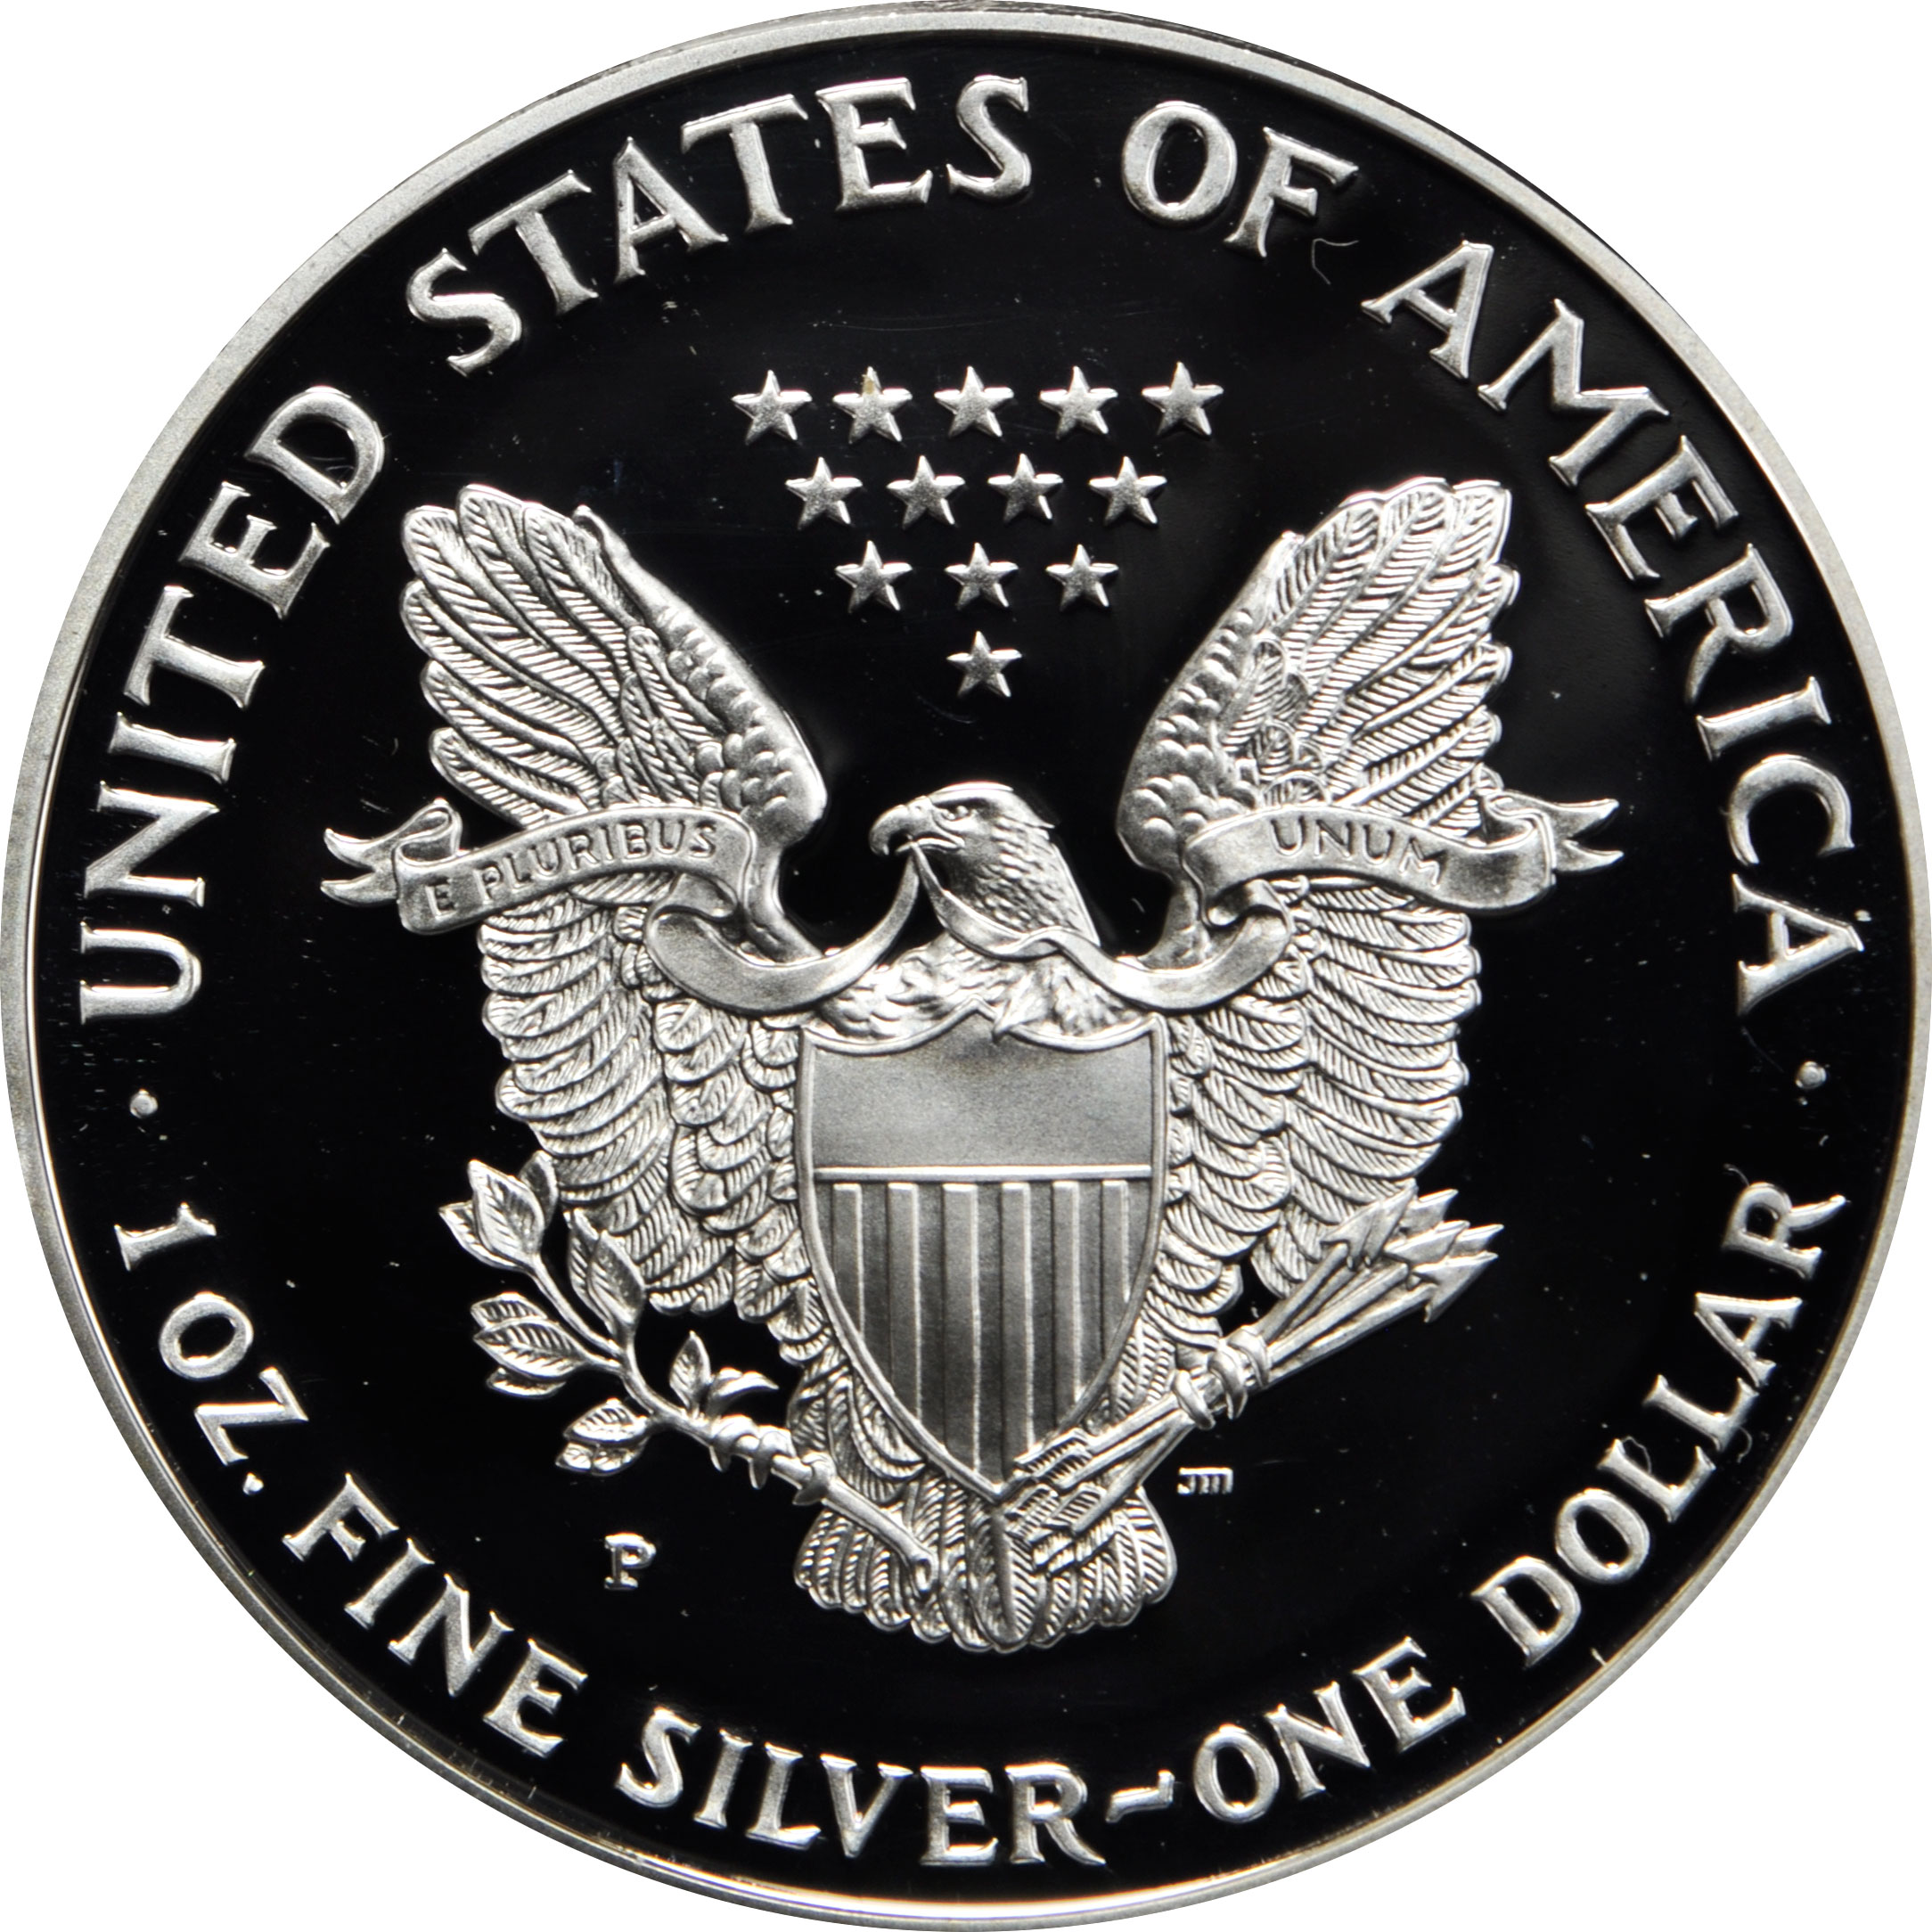 Value Of 1999 1 Silver Coin American Silver Eagle Coin